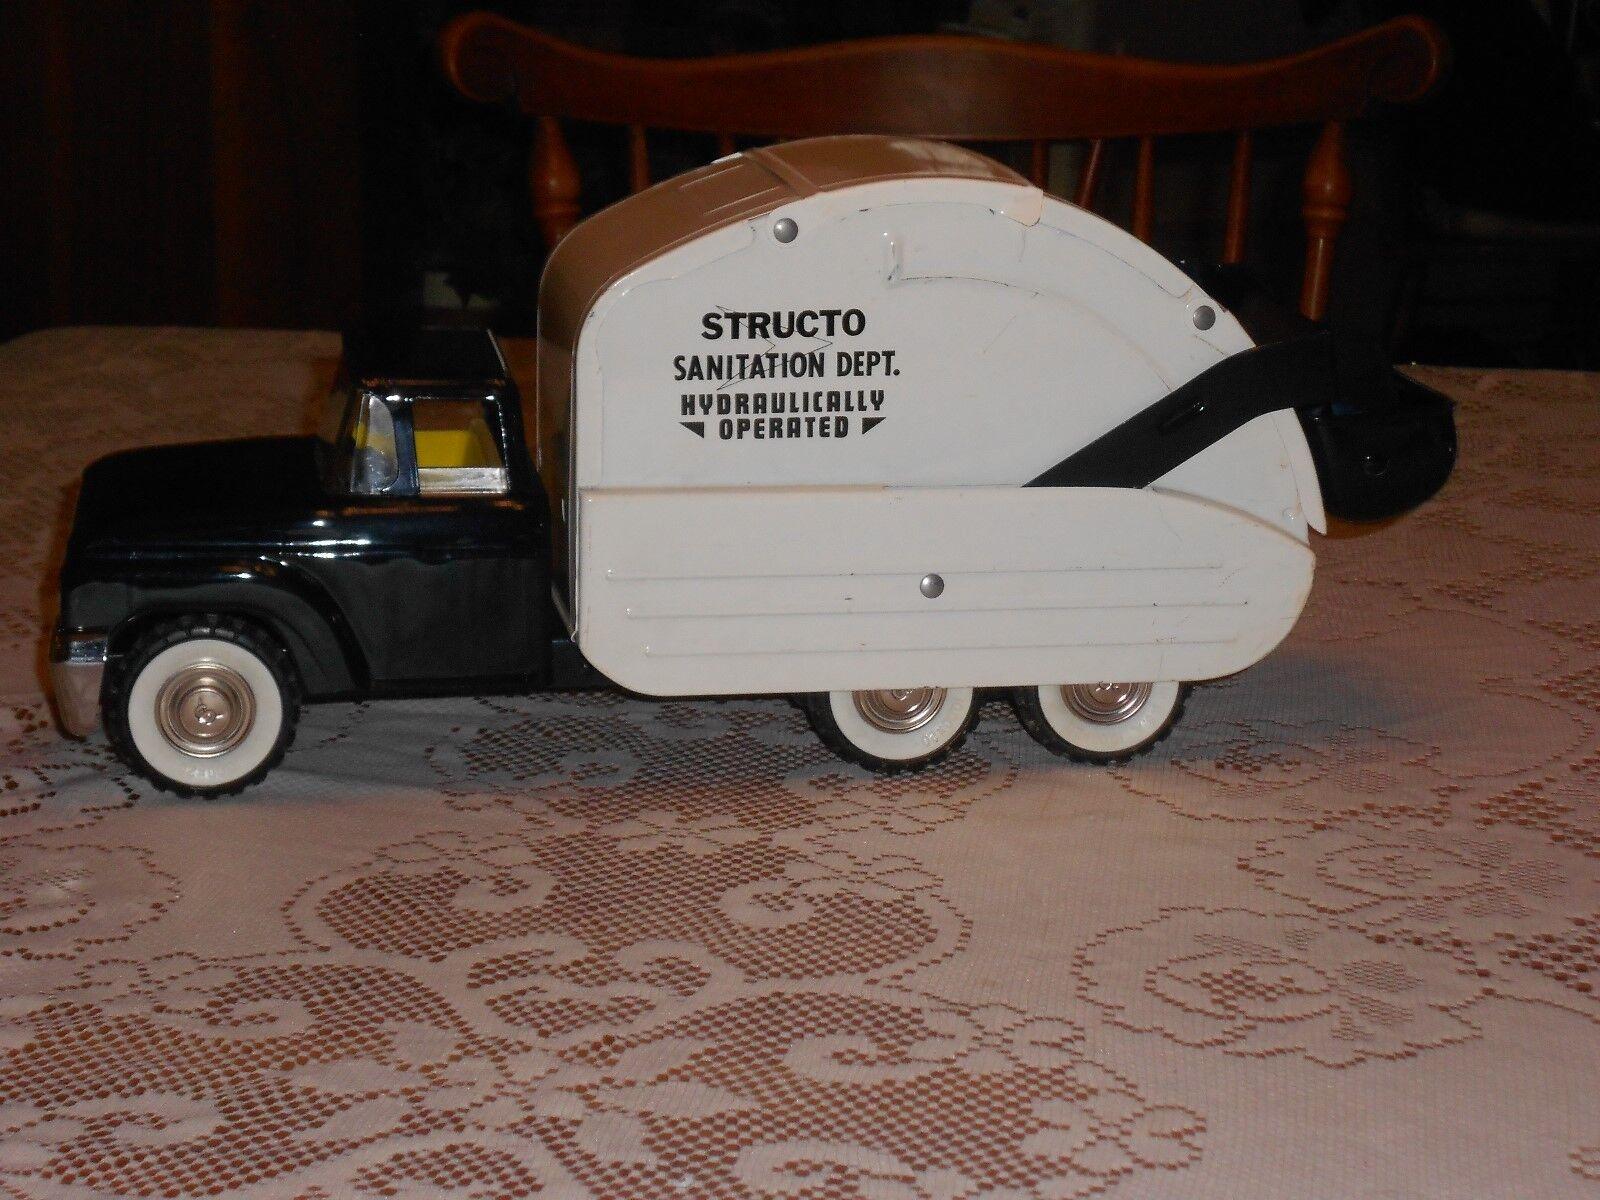 Vintage années 1960 Pressed Steel Structo Sanitation Dept. HYD. Camion Poubelle